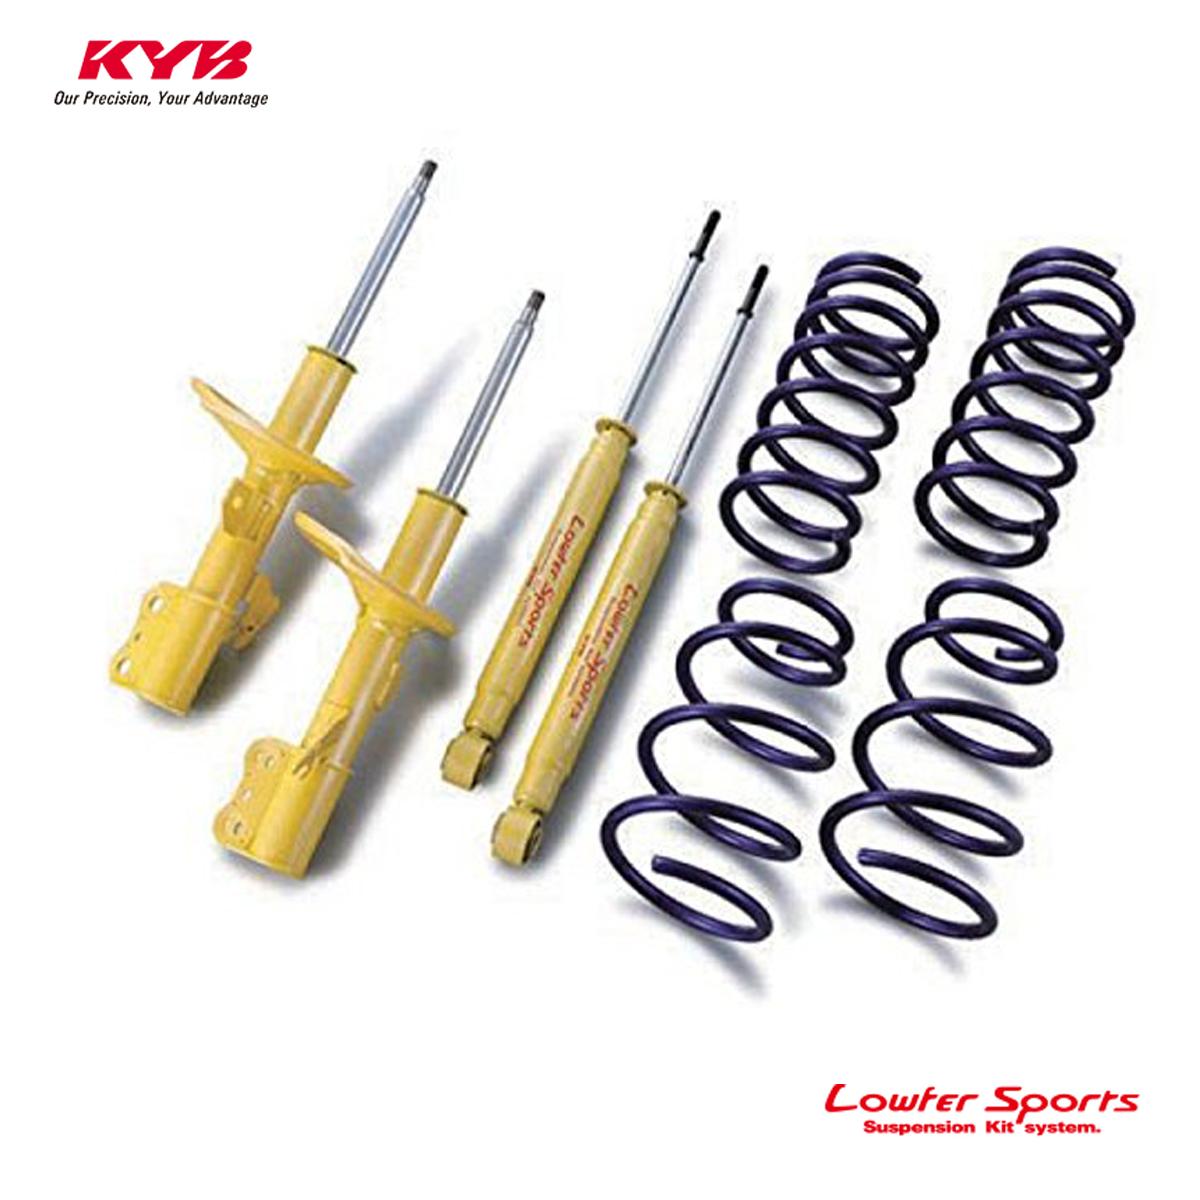 KYB カヤバ ヴィッツ KSP130/NSP130/NCP131 ショックアブソーバー サスペンションキット Lowfer Sports LKIT-KSP130 配送先条件有り